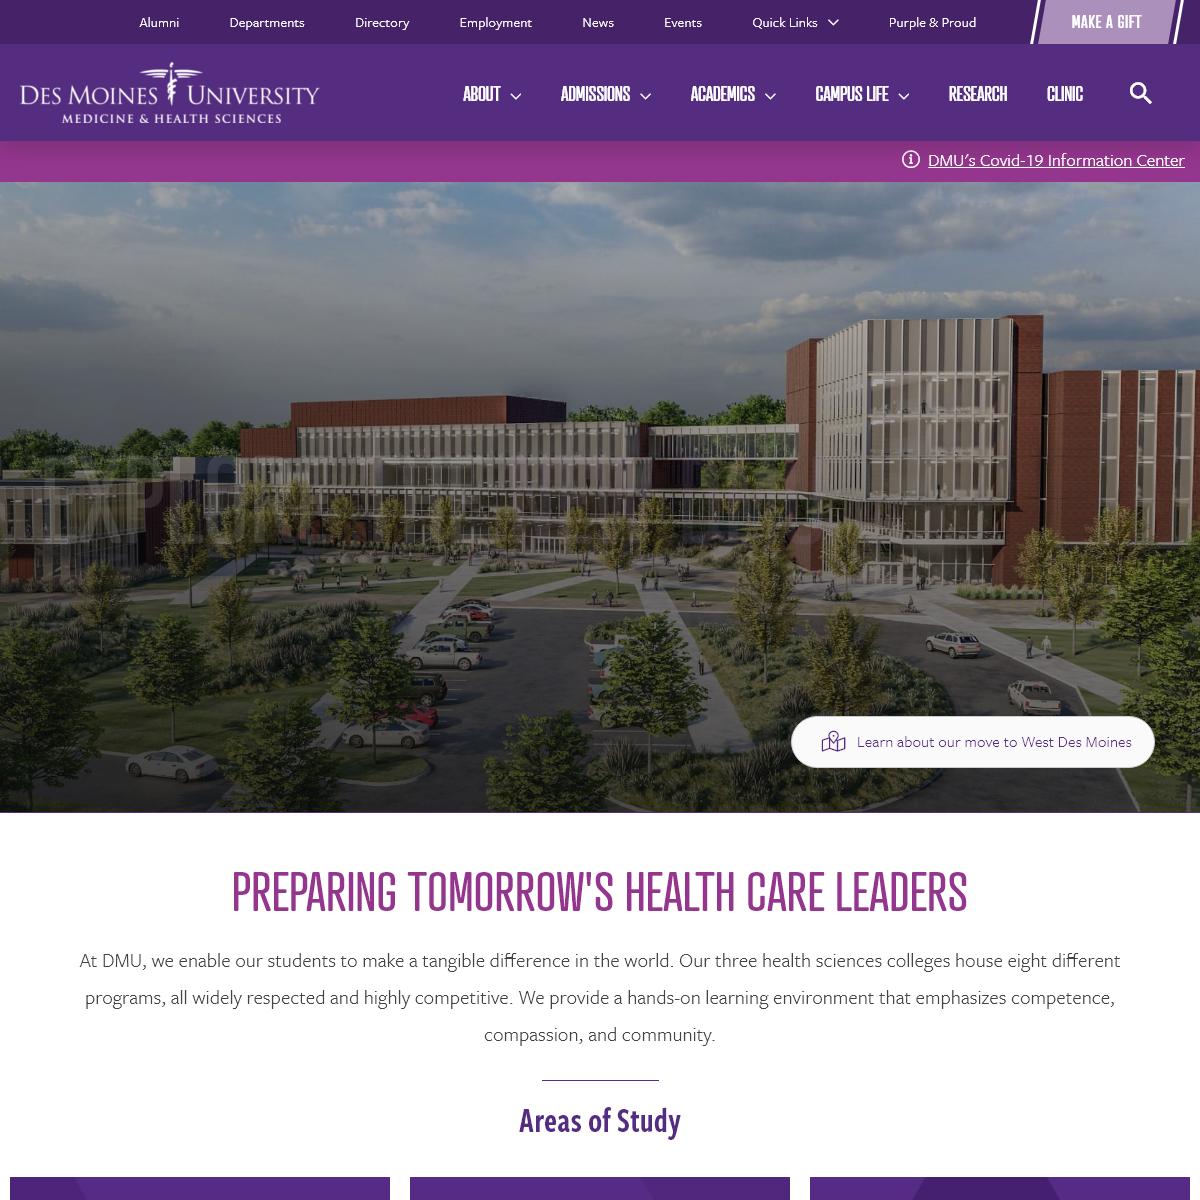 Des Moines University - Medicine and Health Sciences